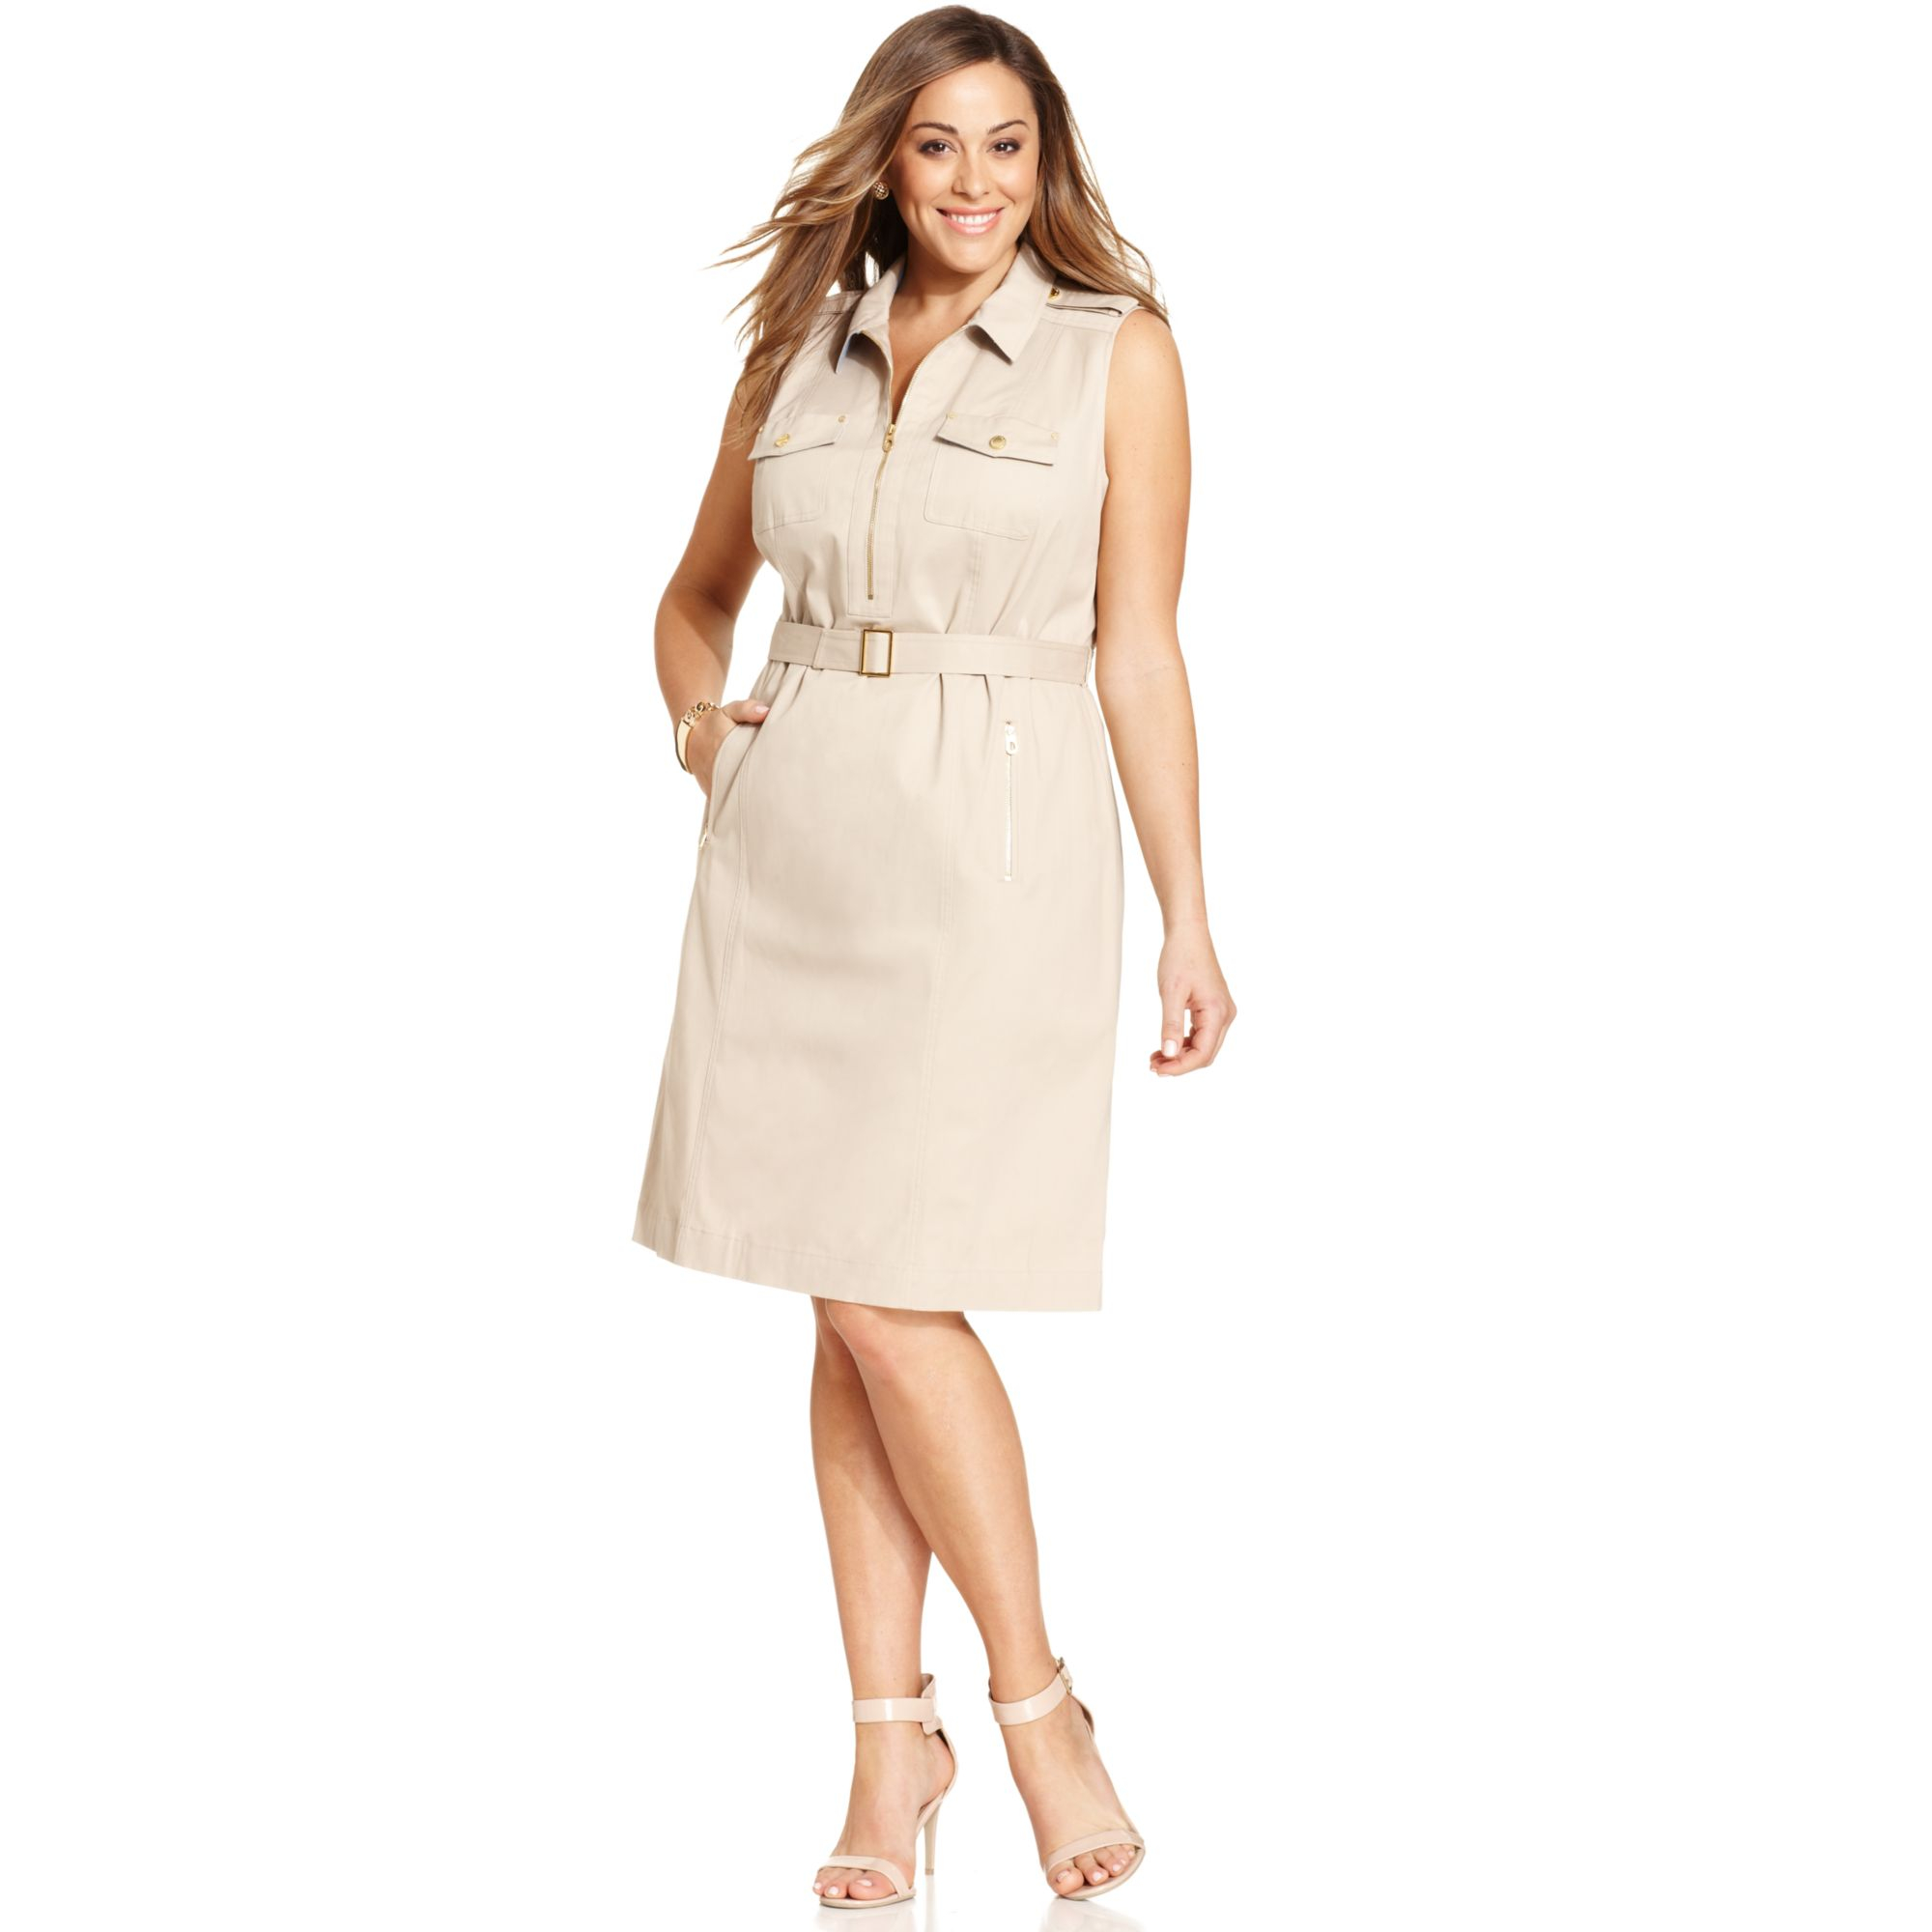 New York Jones Dresses – Fashion dresses